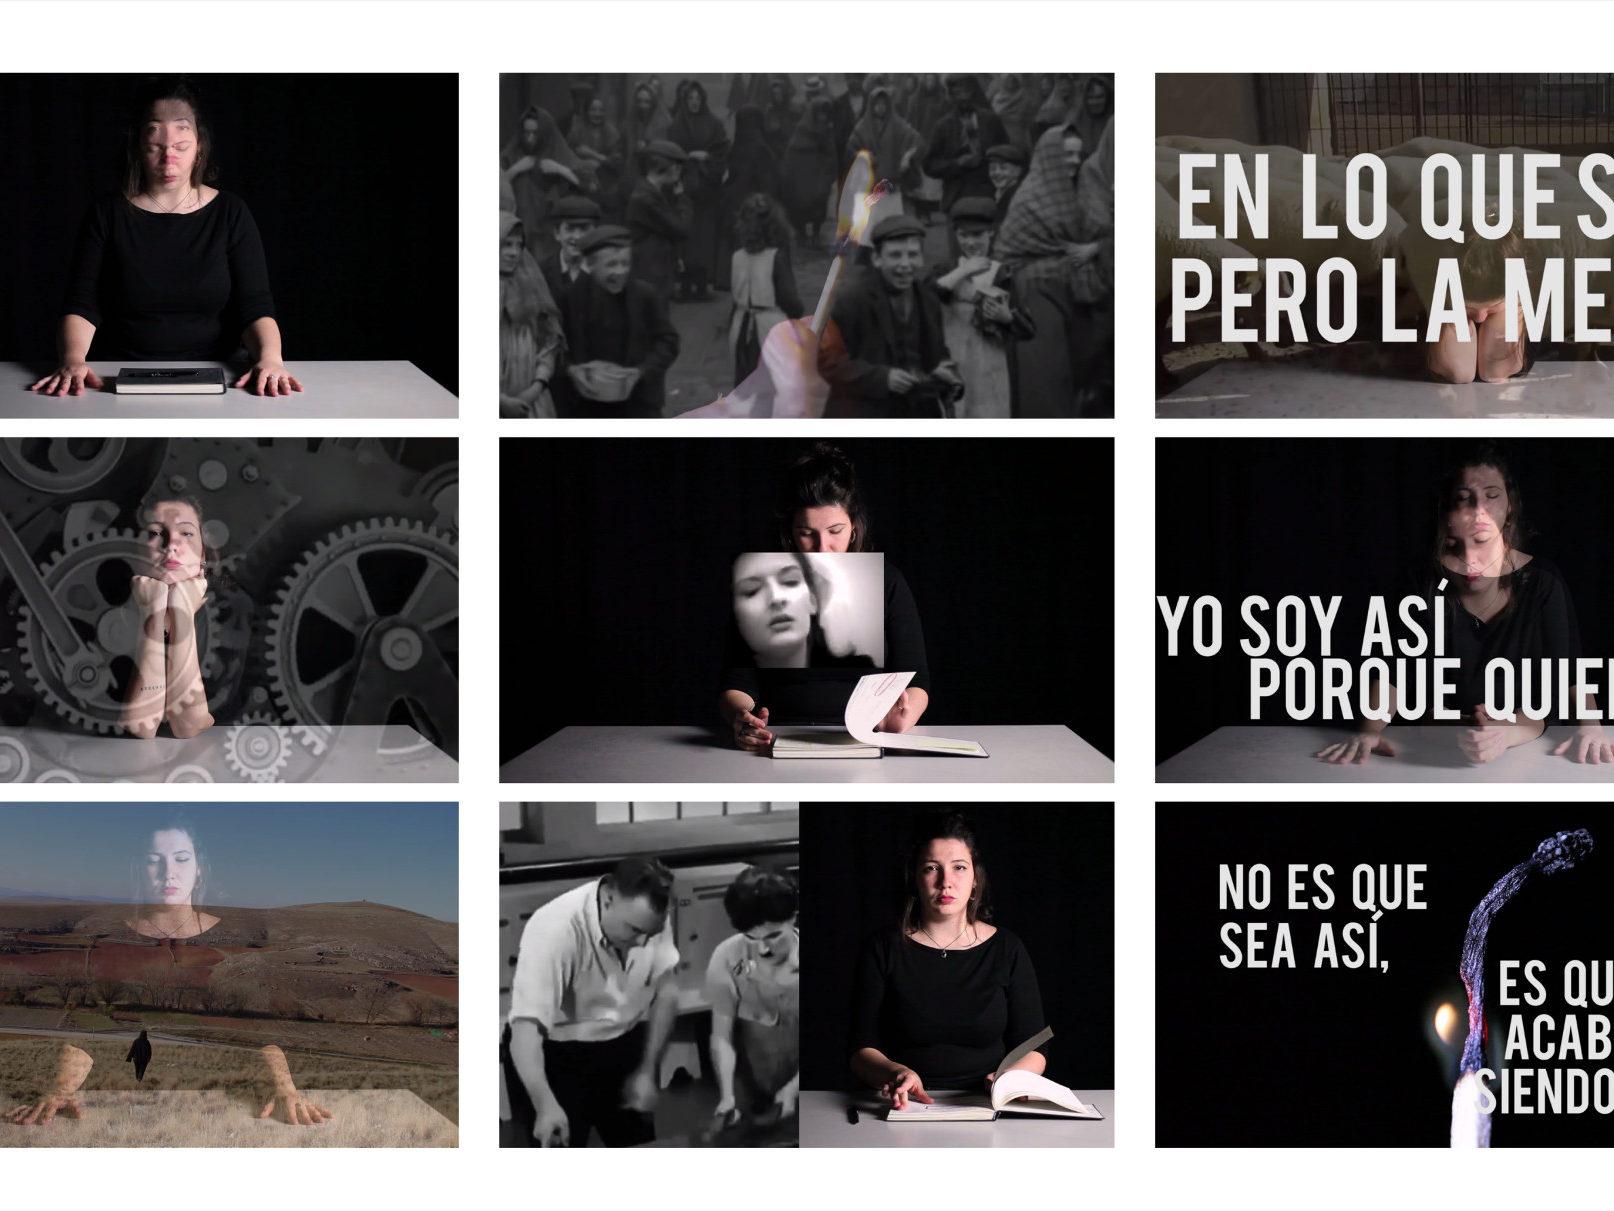 Fotogramas Bloque I Identificacion, 2020. Ensayo audiovisual